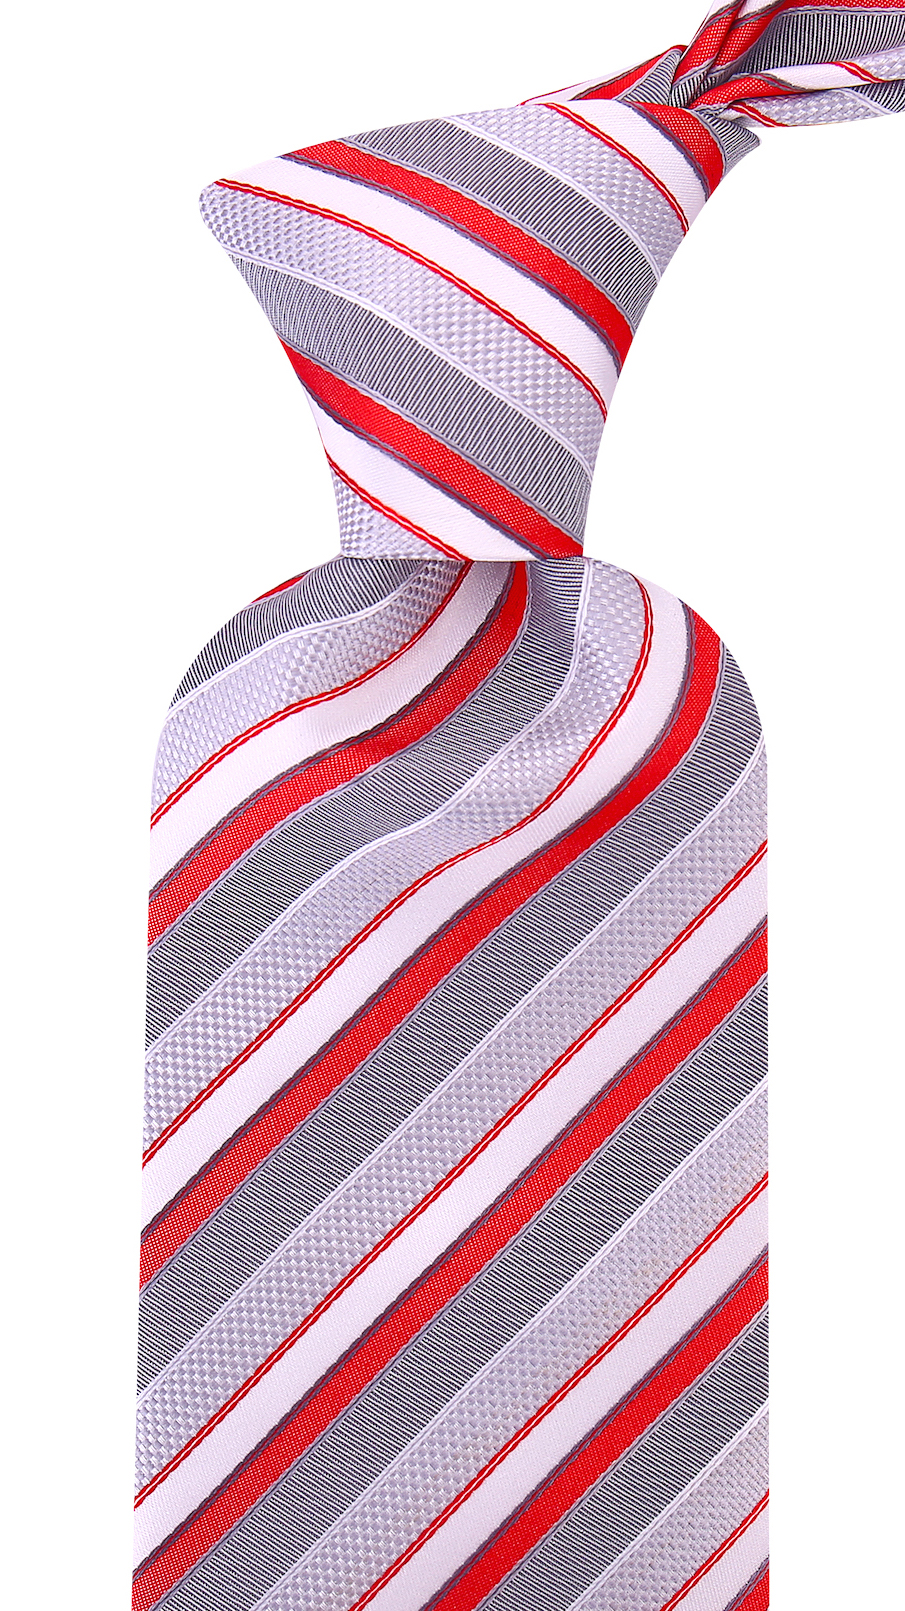 Scott-Allan-Striped-Necktie-Mens-Ties-in-Various-Colors thumbnail 25